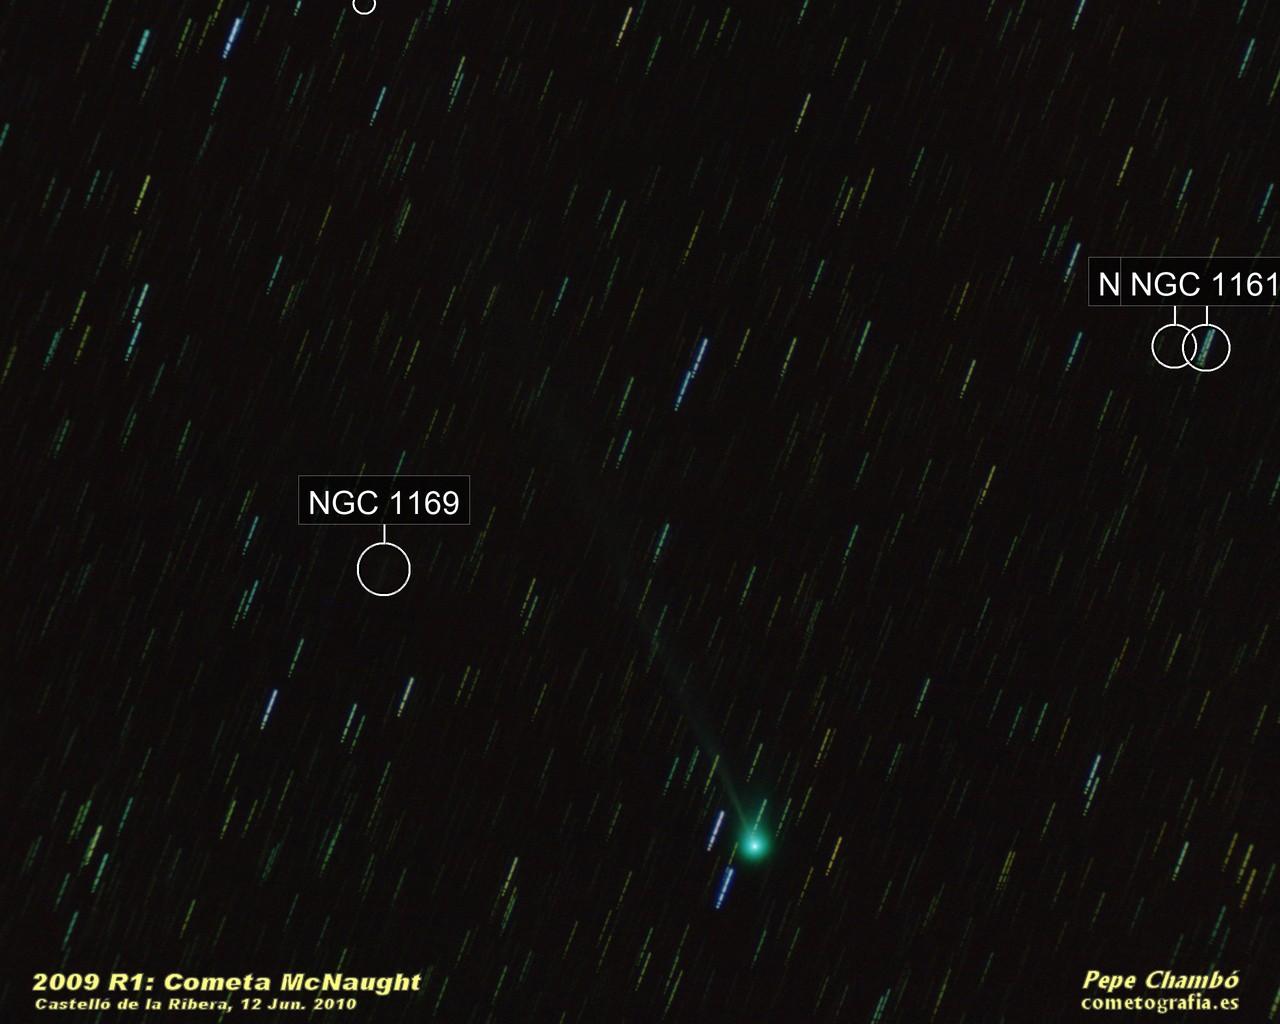 2009 R1 McNaught Comet